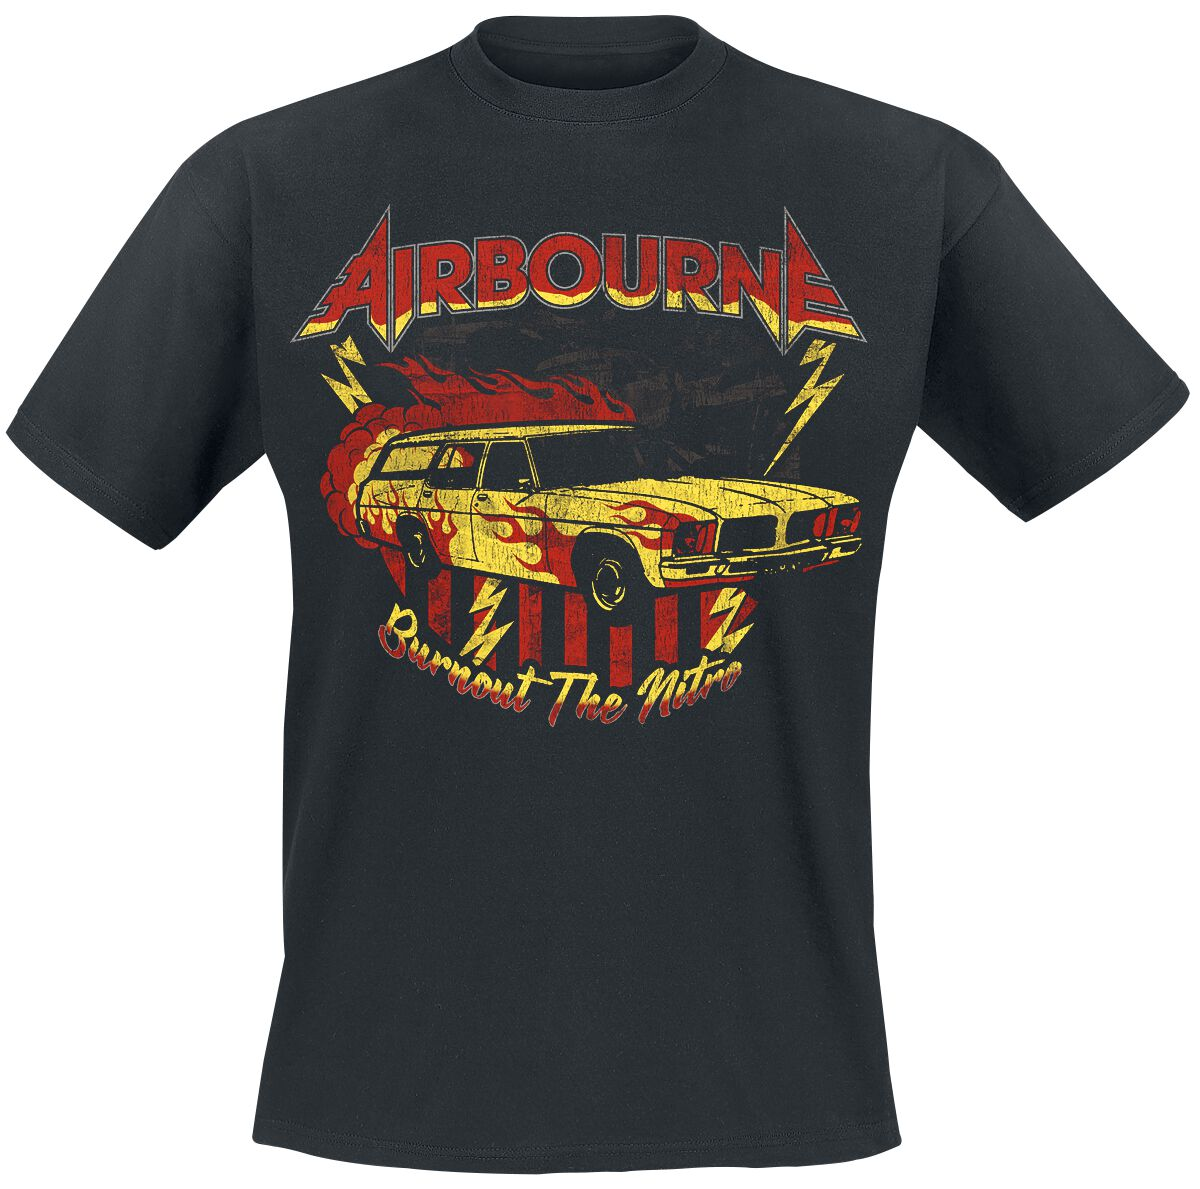 Image of Airbourne Nitro Vintage T-Shirt schwarz